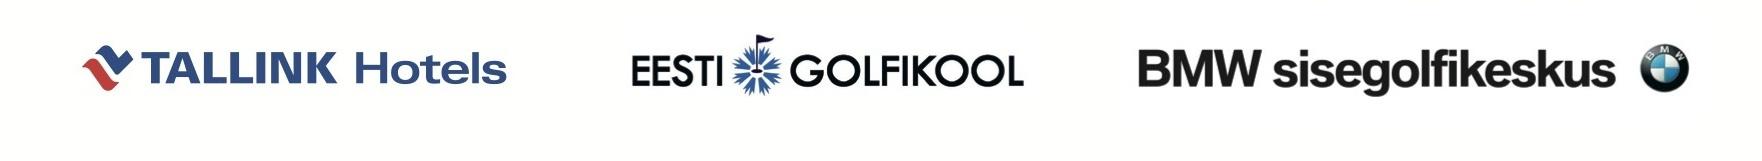 Golf_naistepaev2014_logode riba